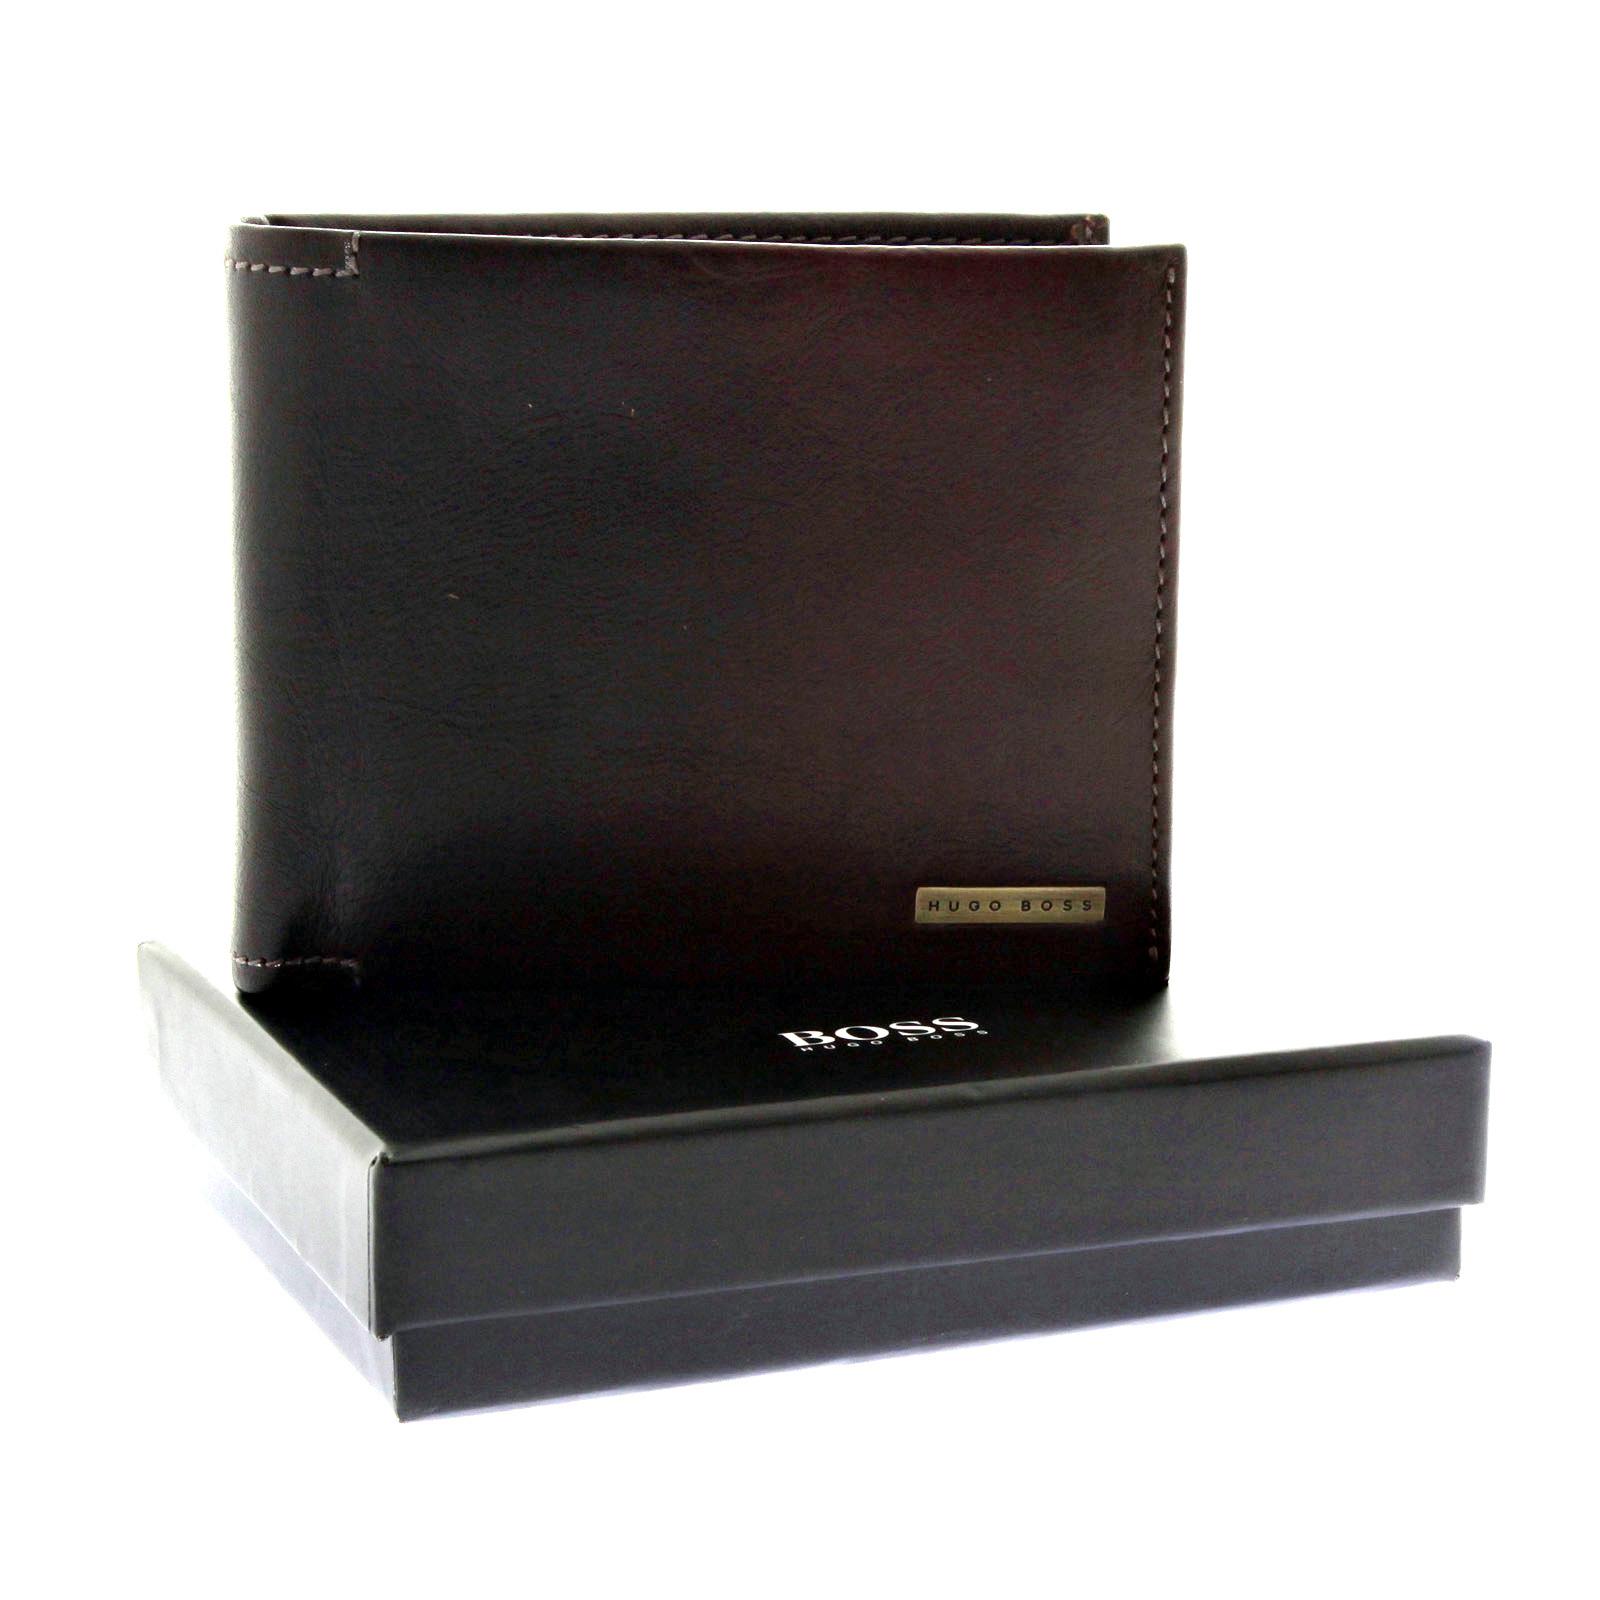 hugo boss wallet yersett boxed brown leather wallet